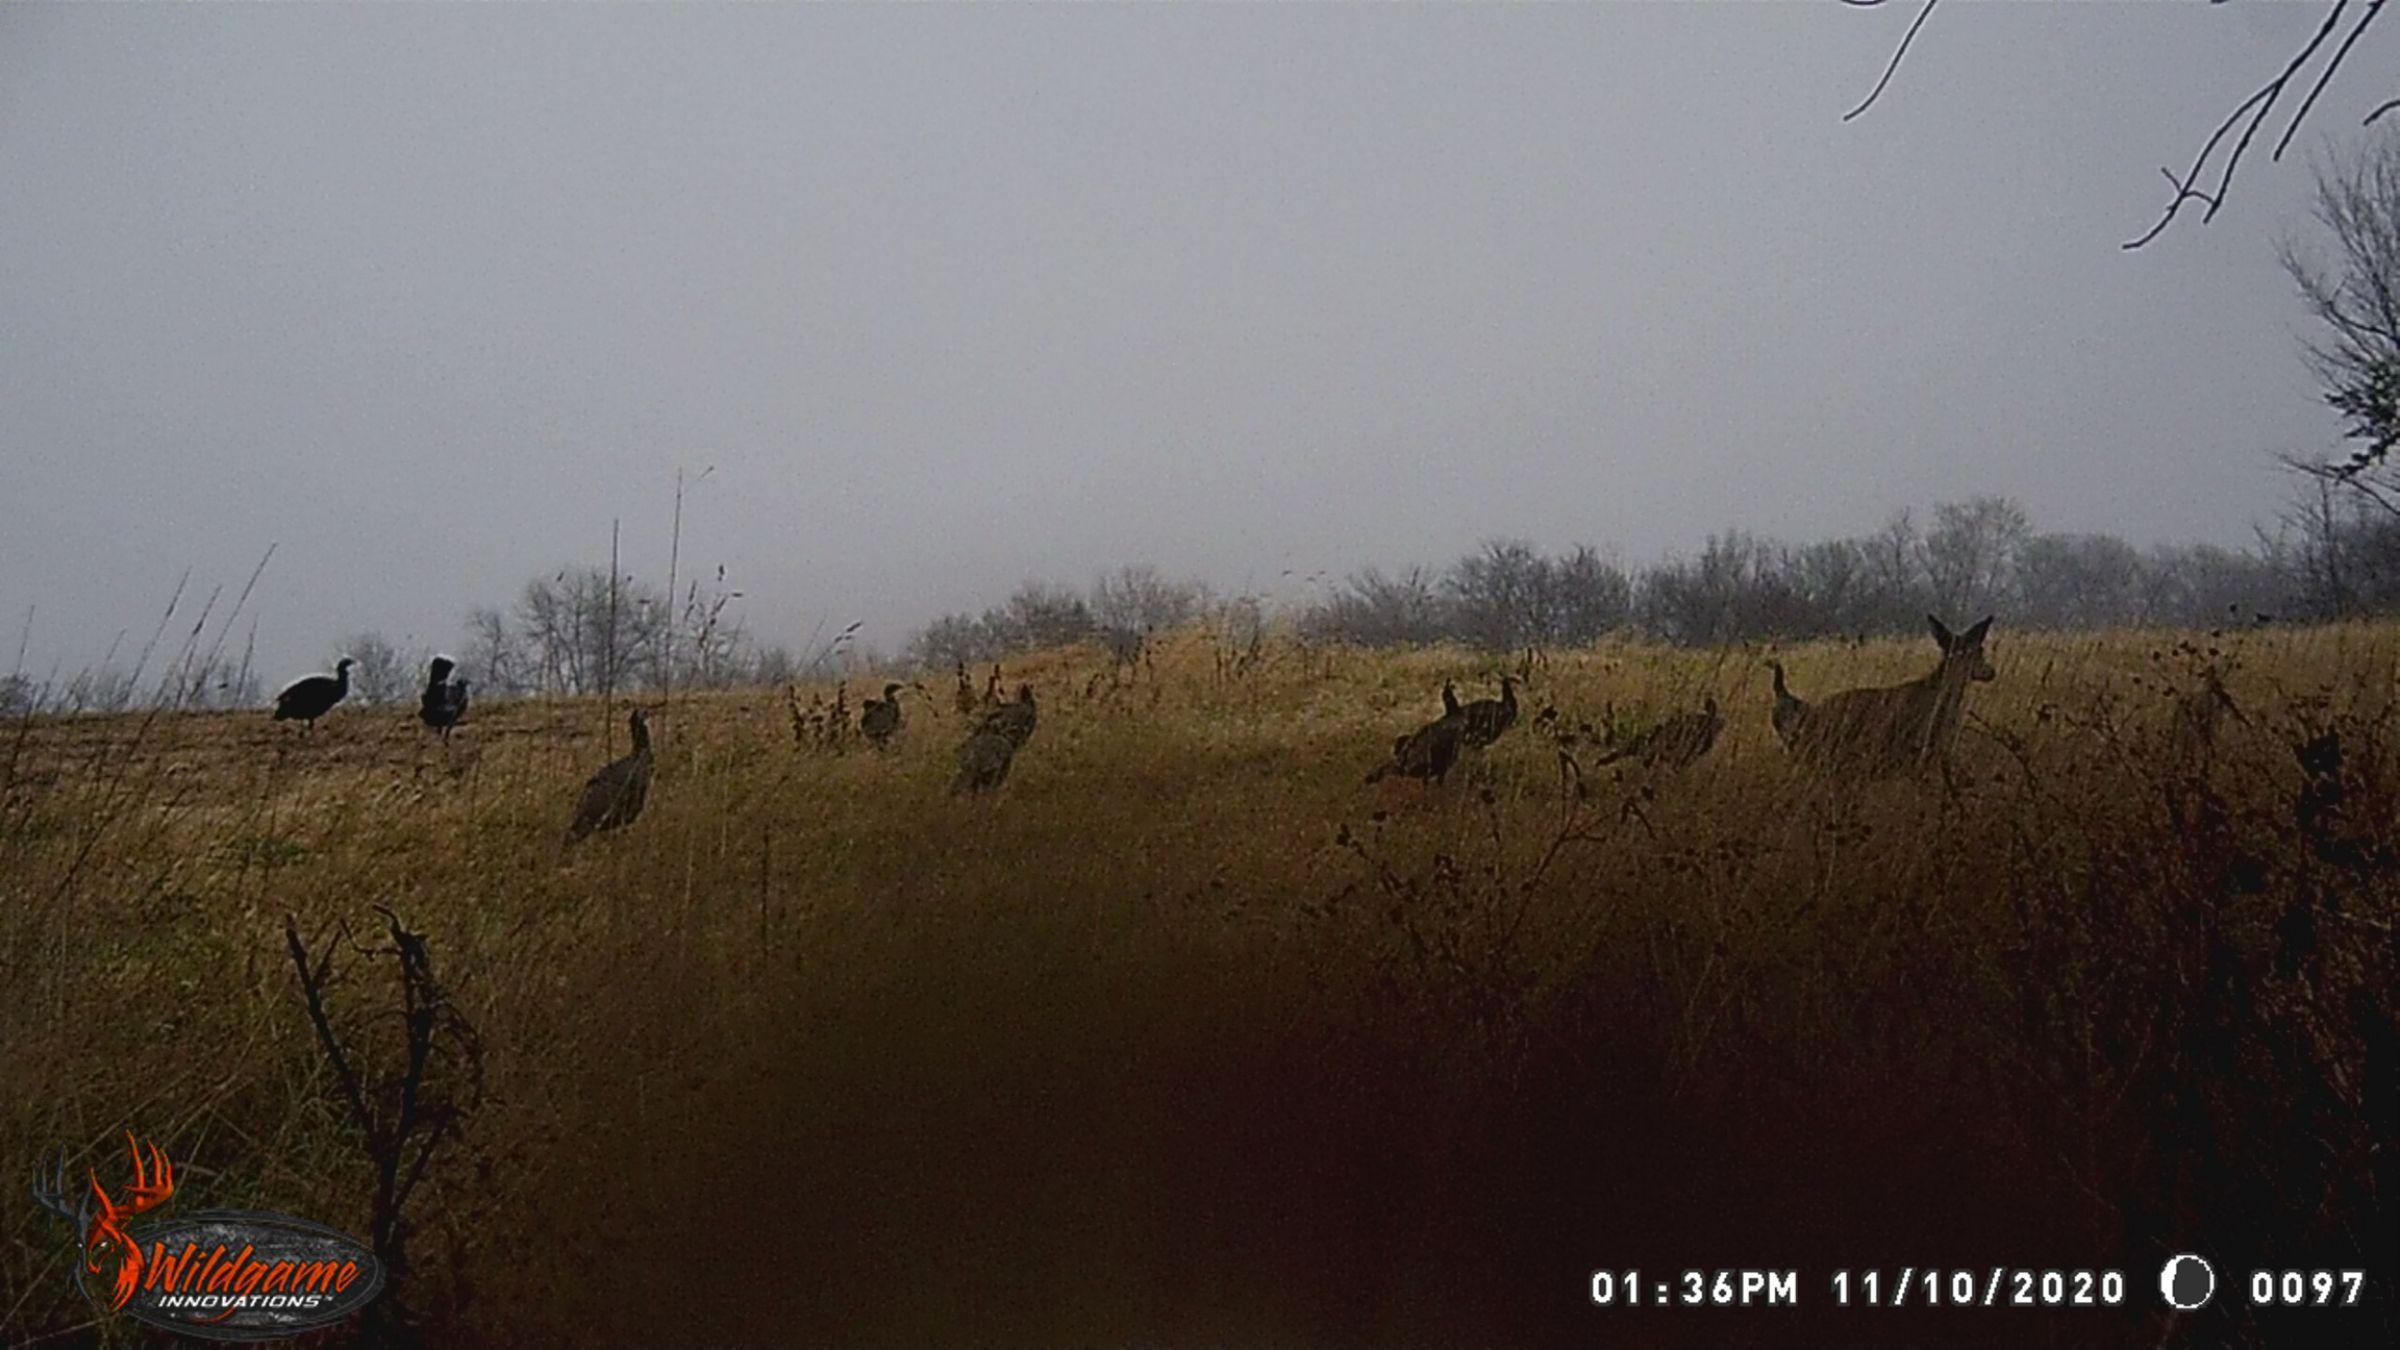 land-warren-county-iowa-63-acres-listing-number-15253-0-2020-11-17-170007.jpg